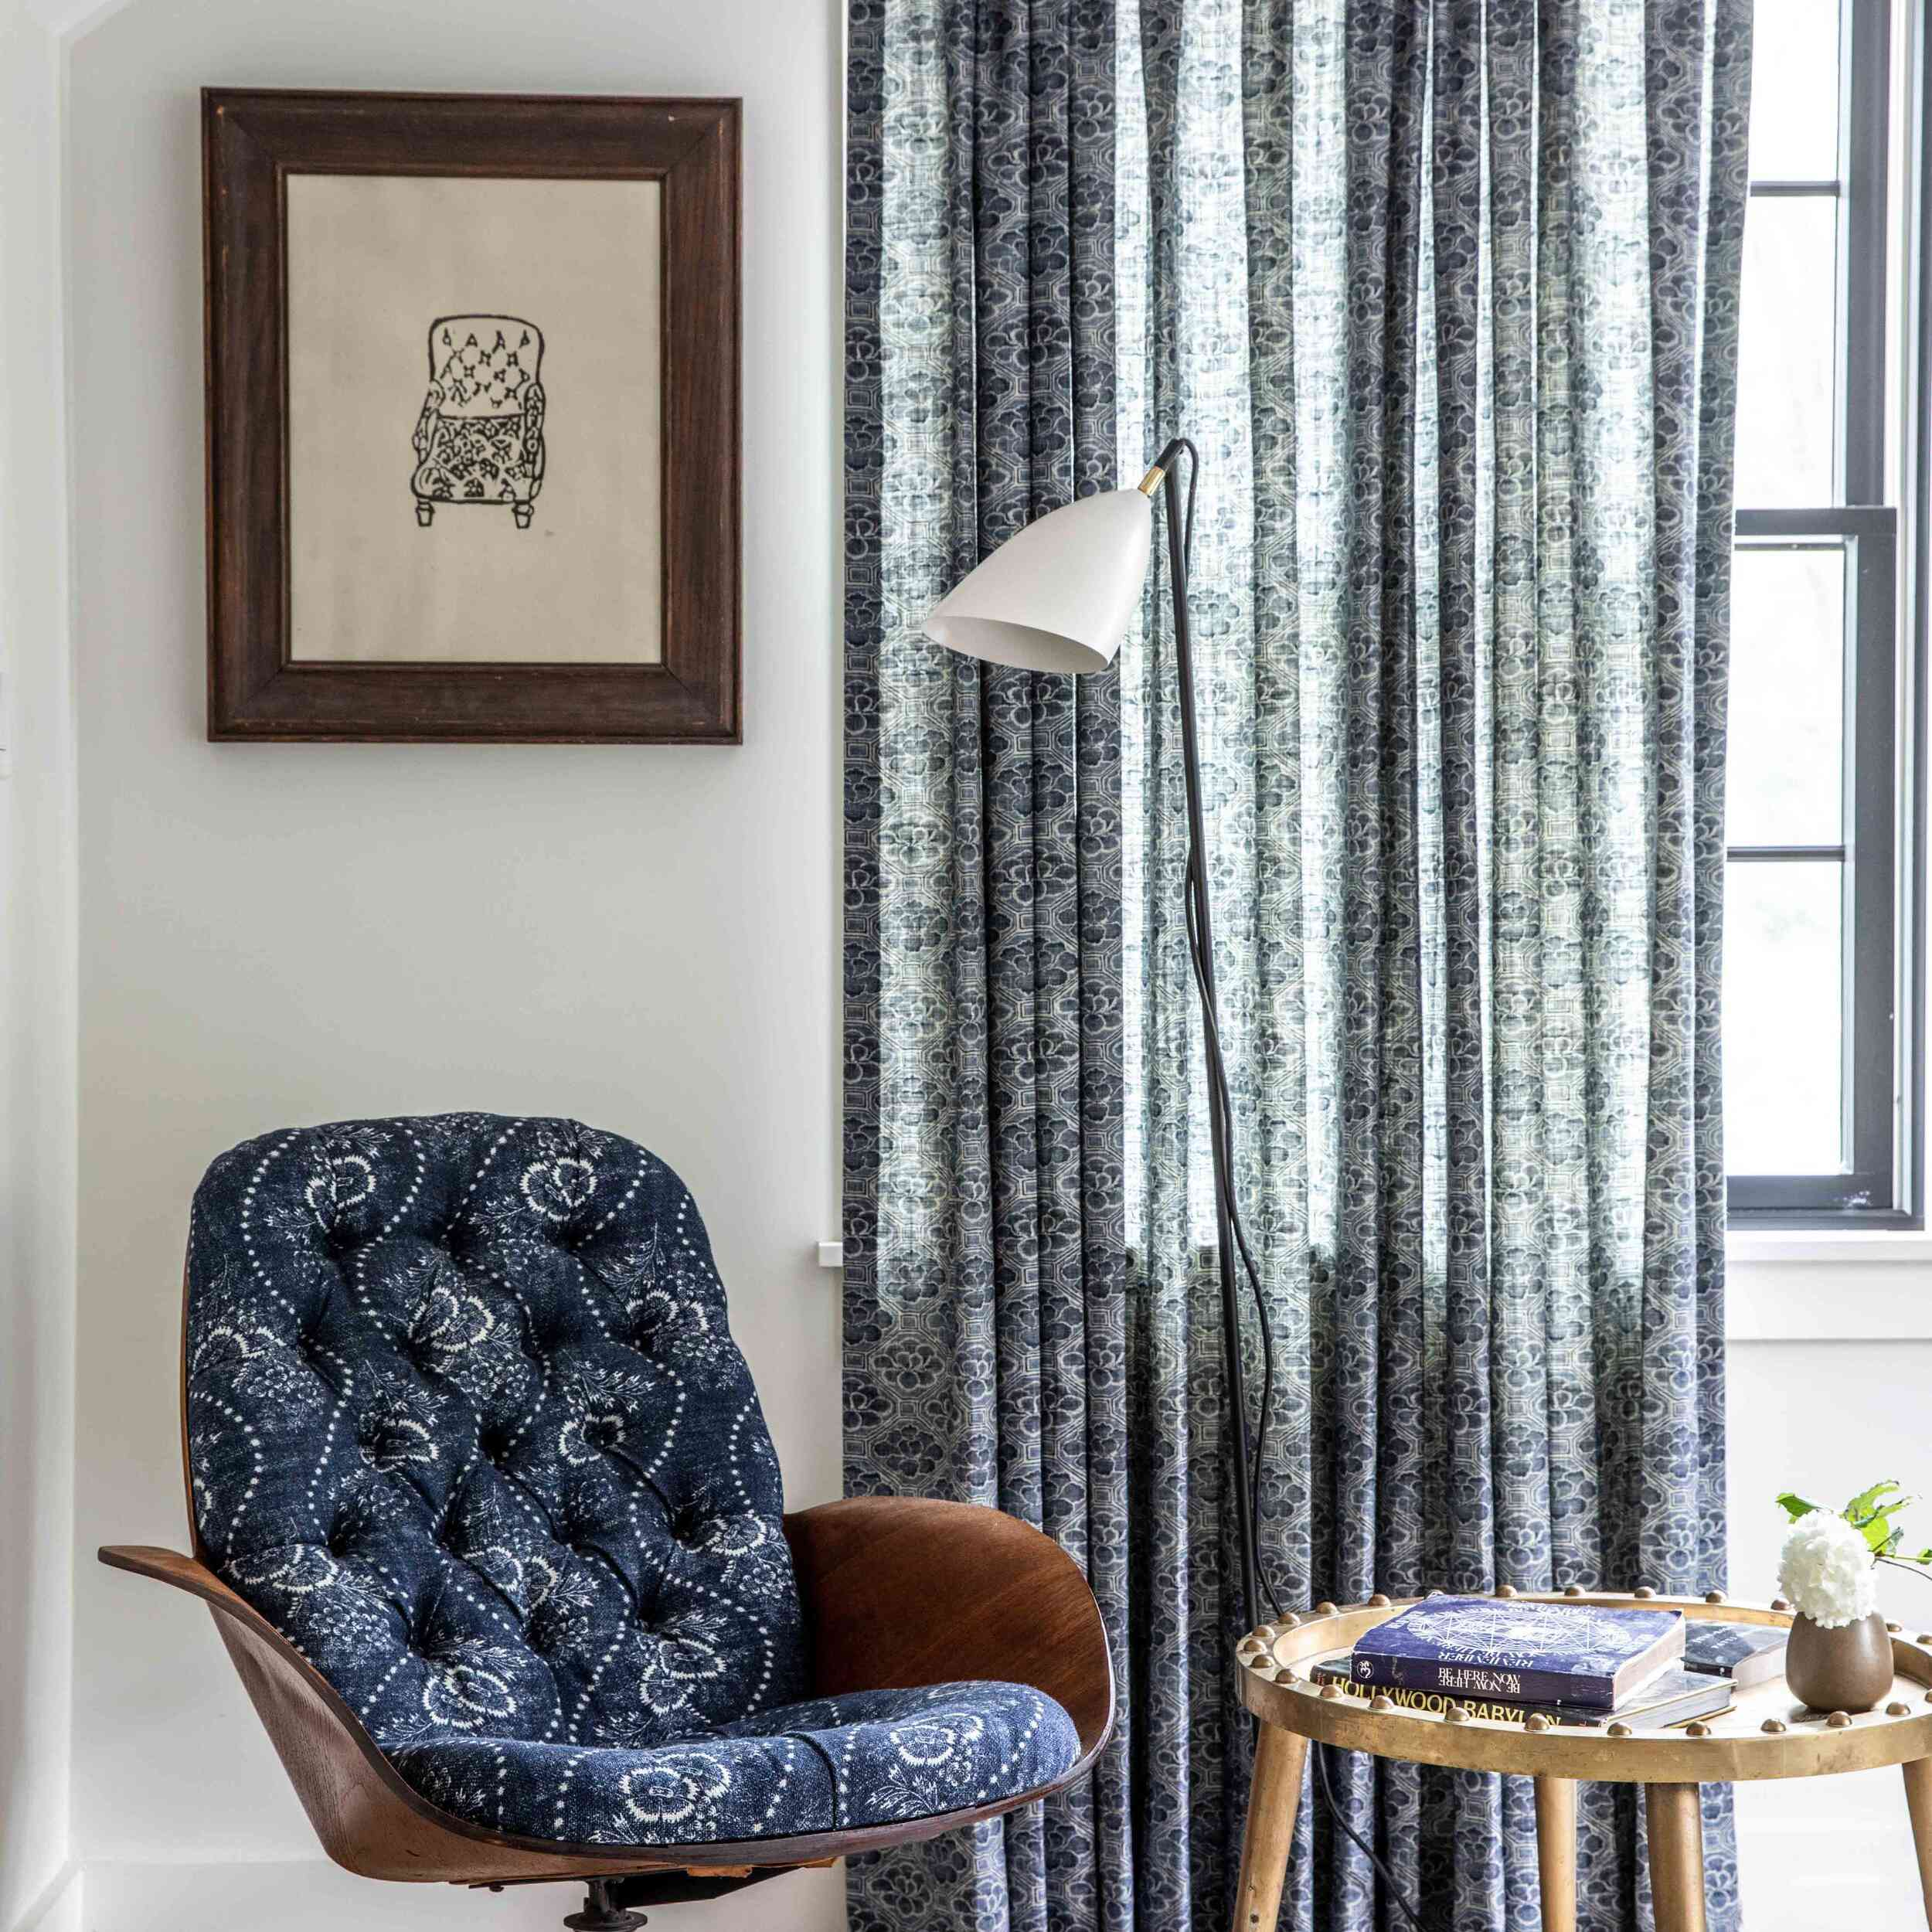 A room with indigo curtains and an indigo chair